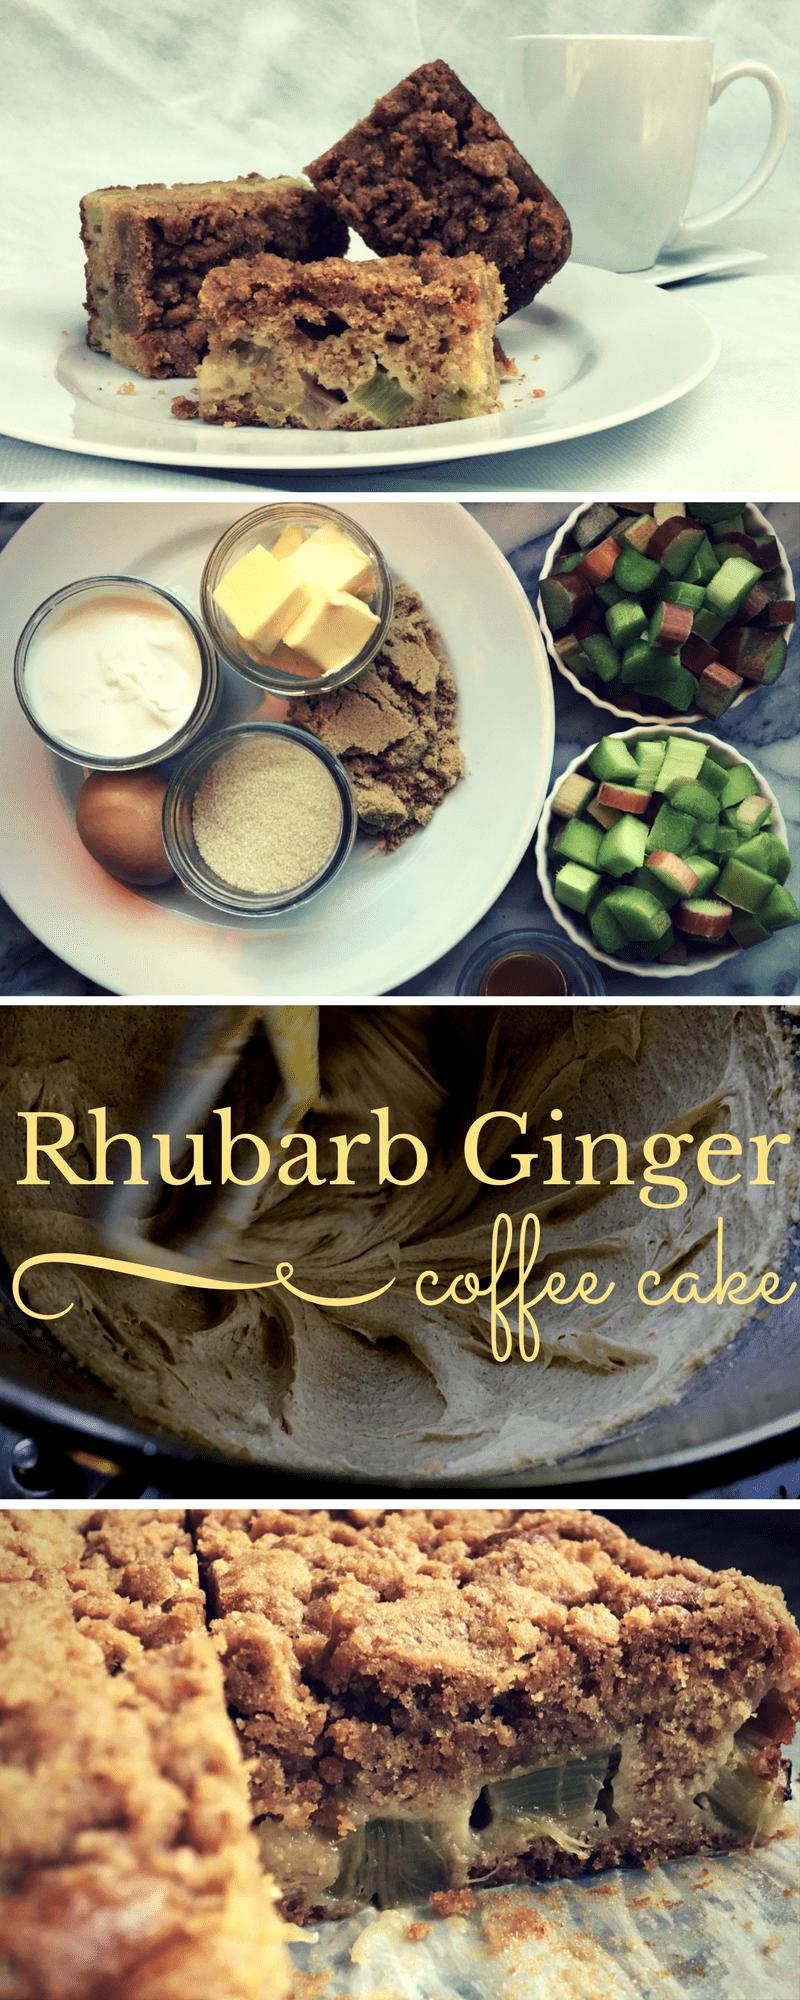 RhubarbGingerCoffecake